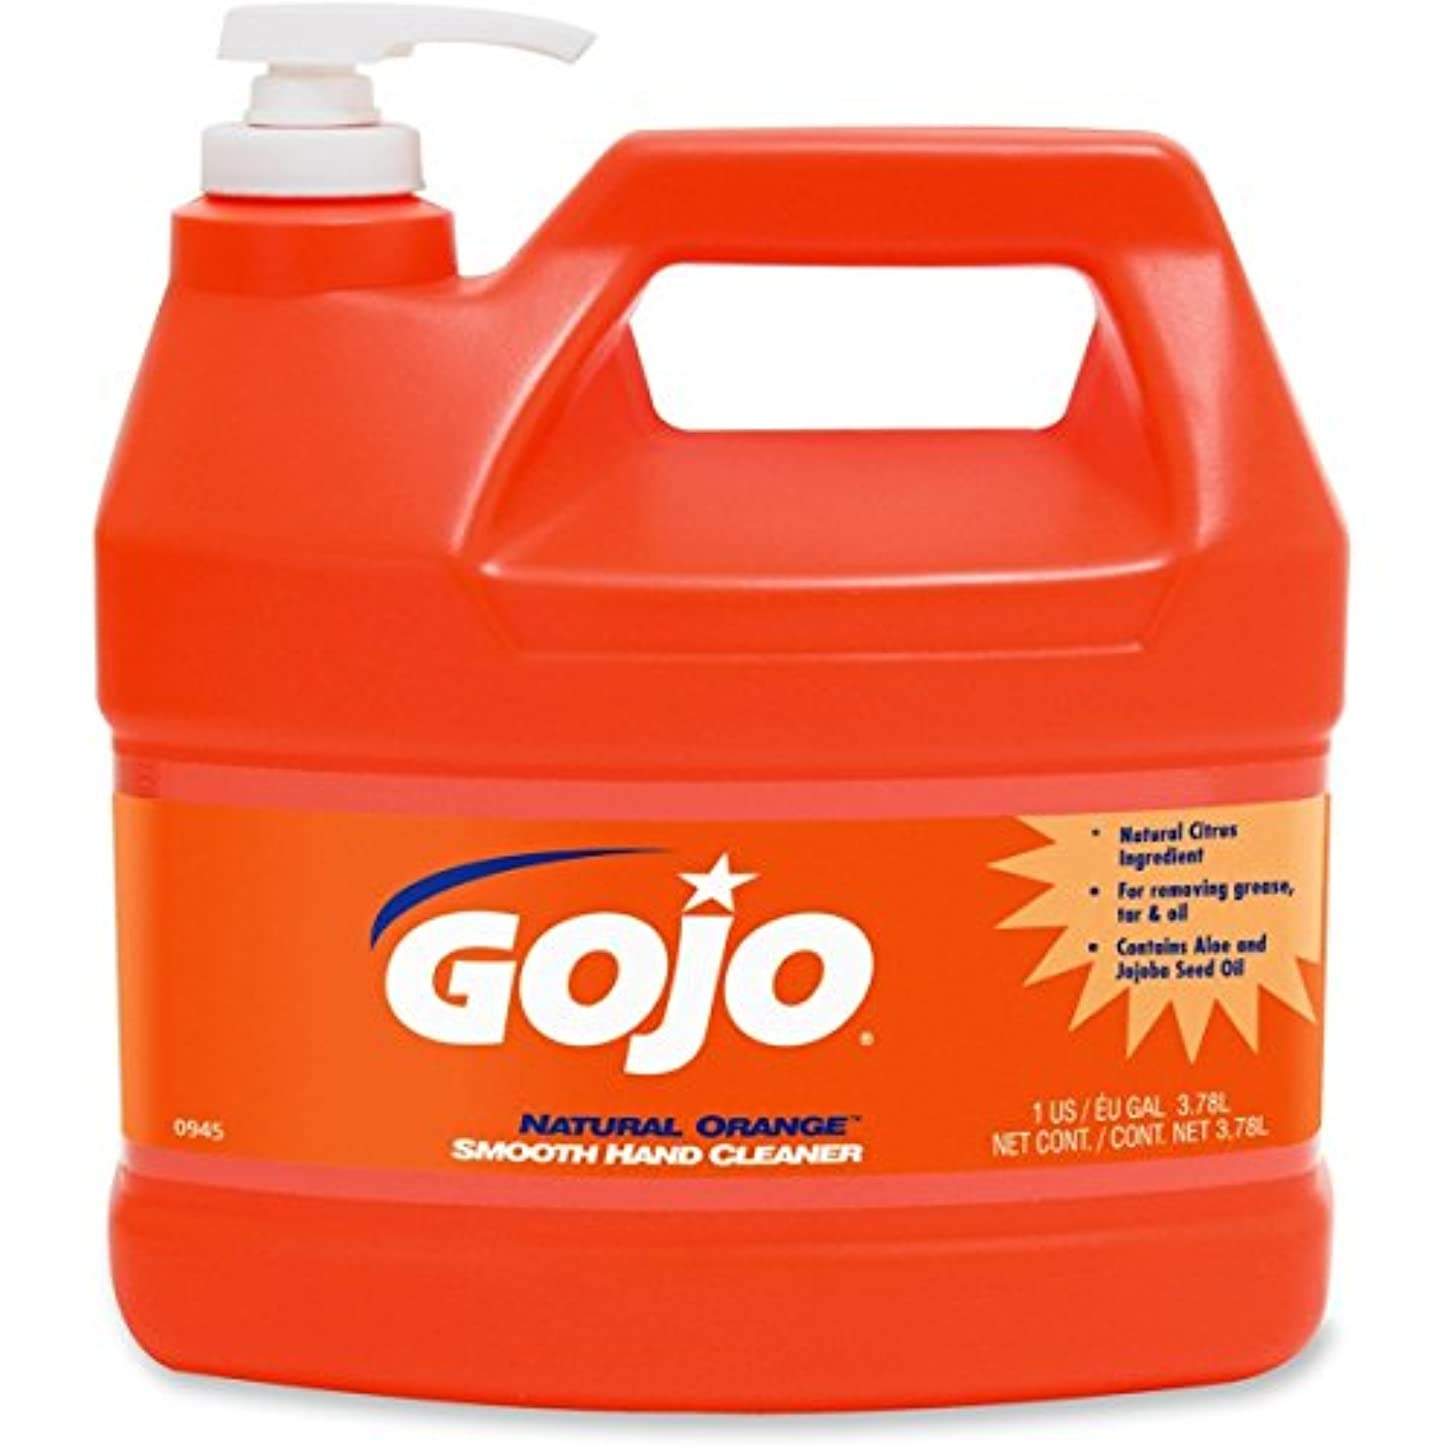 goj094504 – GOJOナチュラルオレンジSmooth heavy-duty Hand Cleaner